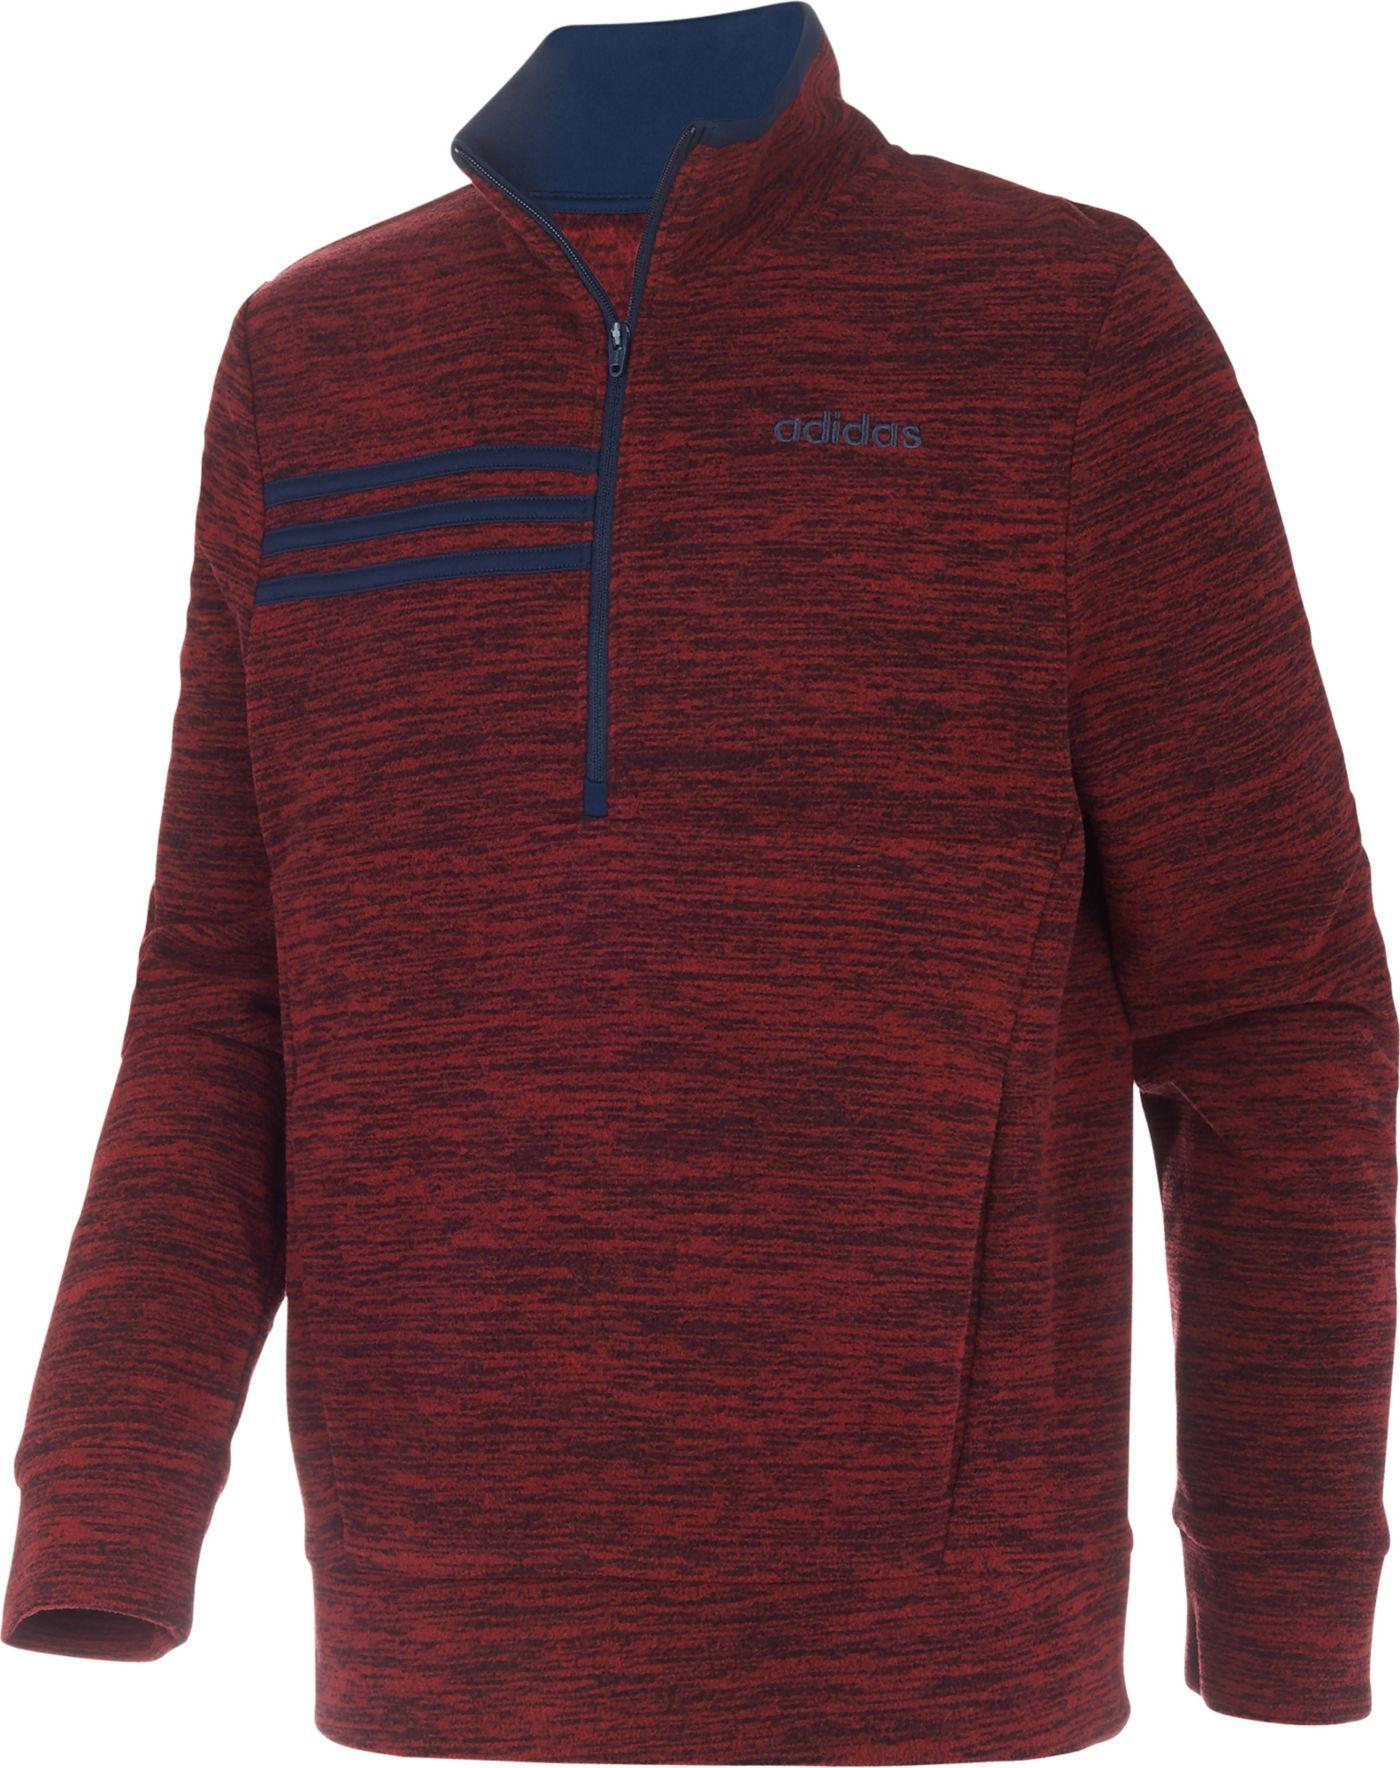 adidas Boys' Microfleece 1/2 Zip Long Sleeve Shirt